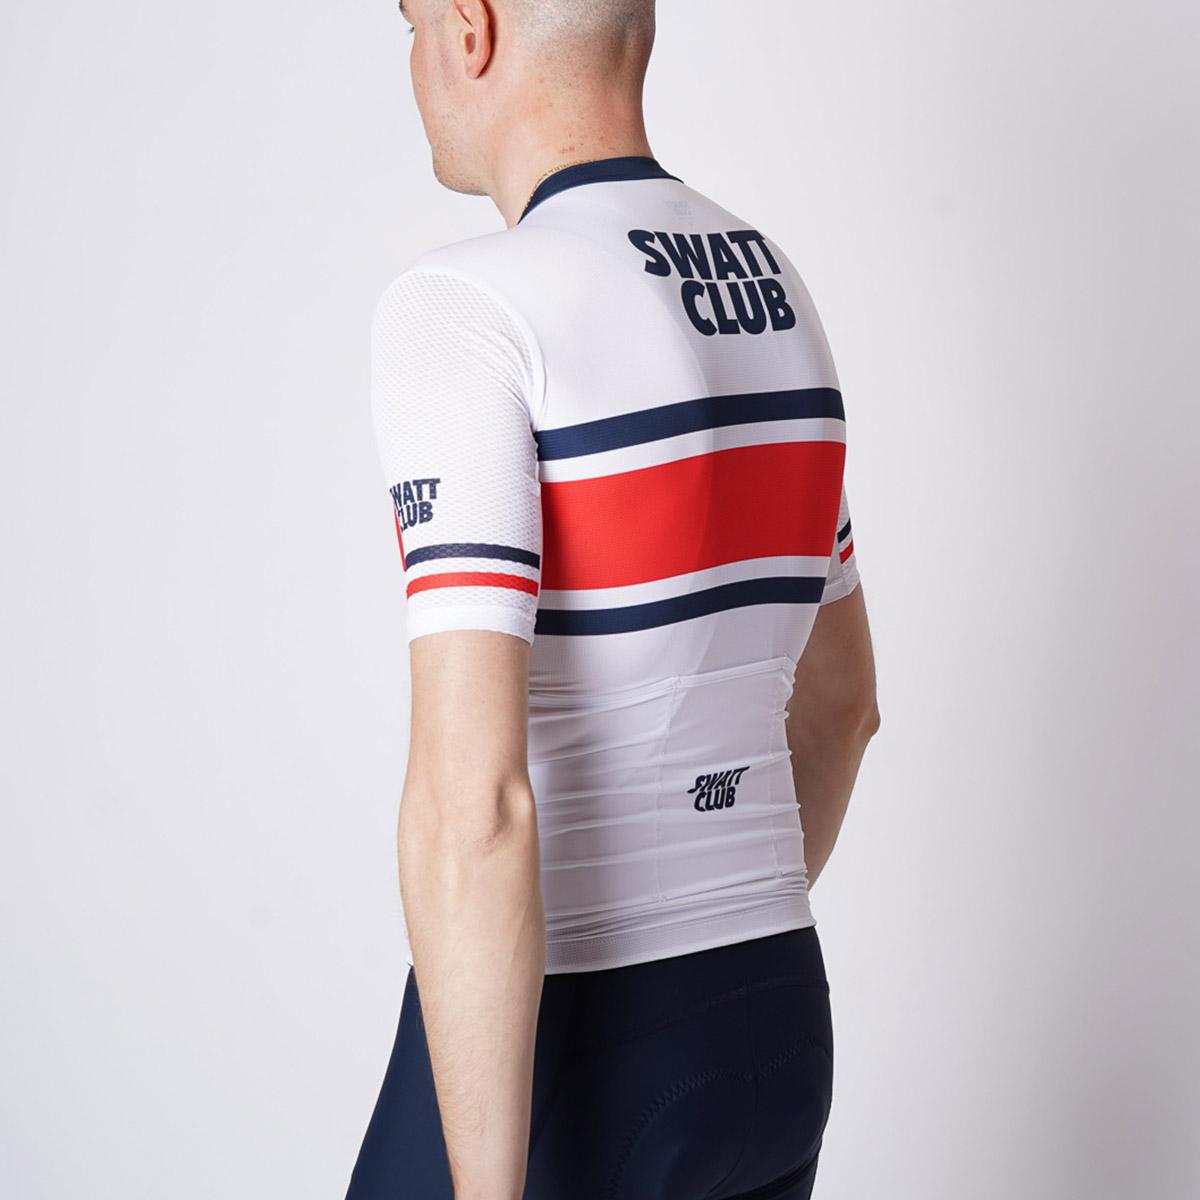 Paris cycling jersey swatt club